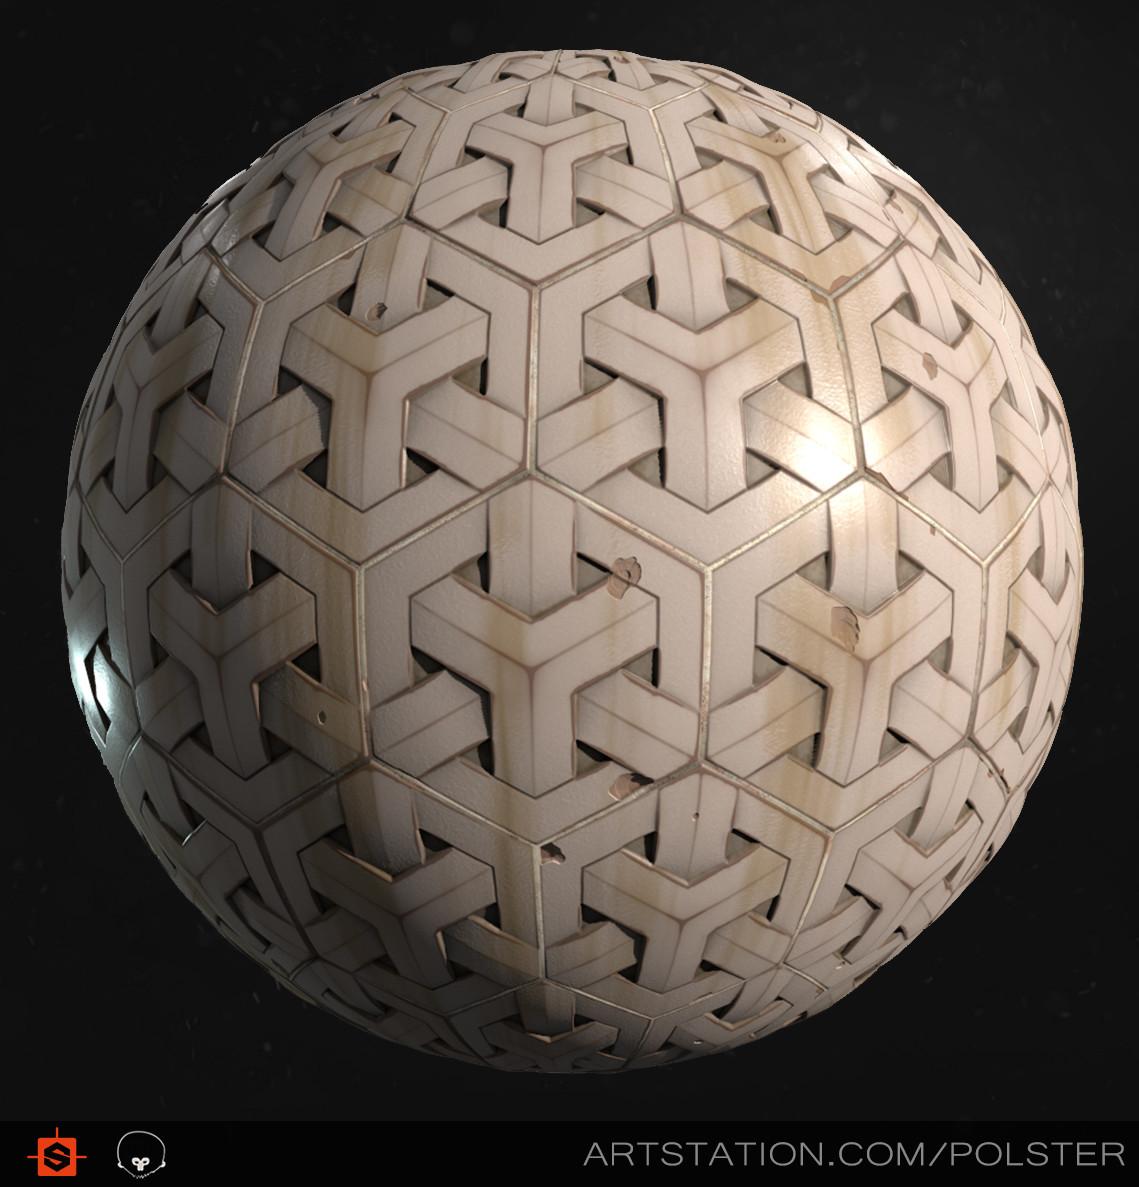 Stefan polster geoweave sphere